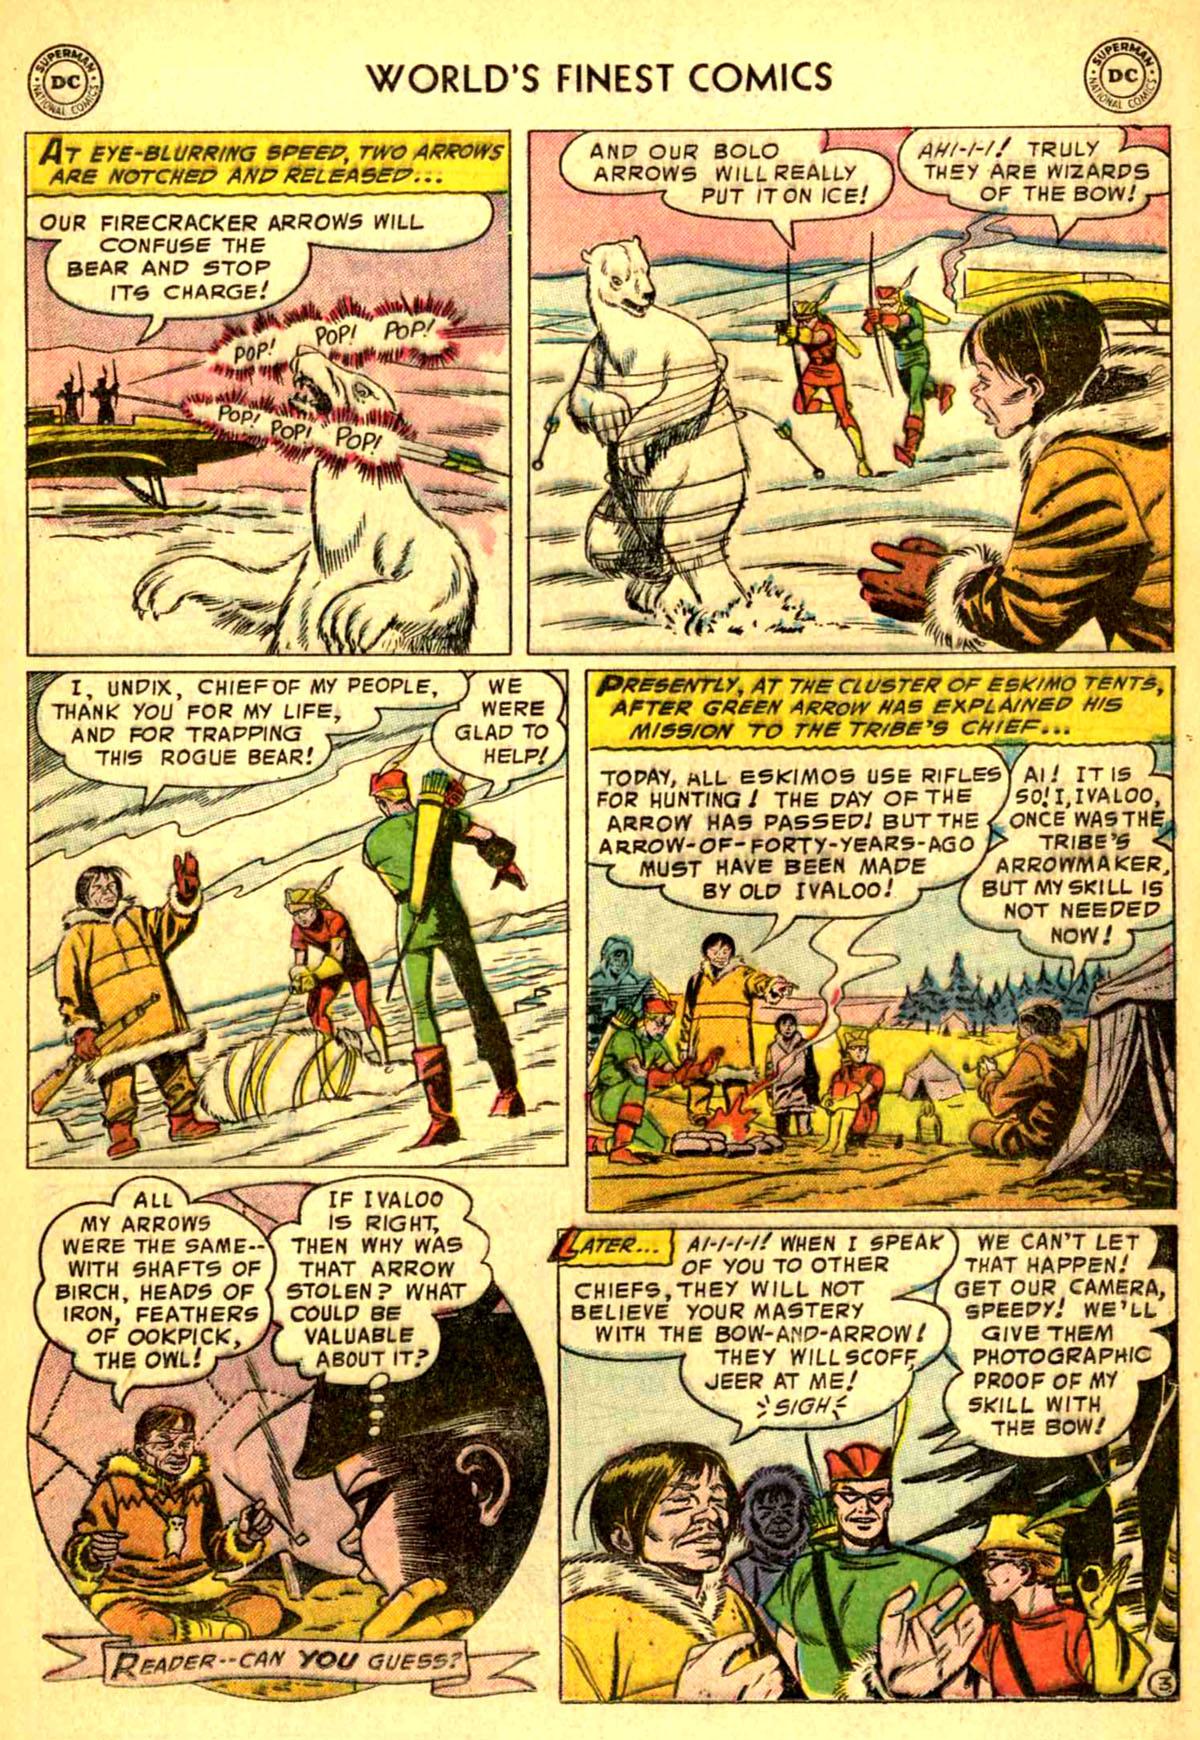 Read online World's Finest Comics comic -  Issue #77 - 19